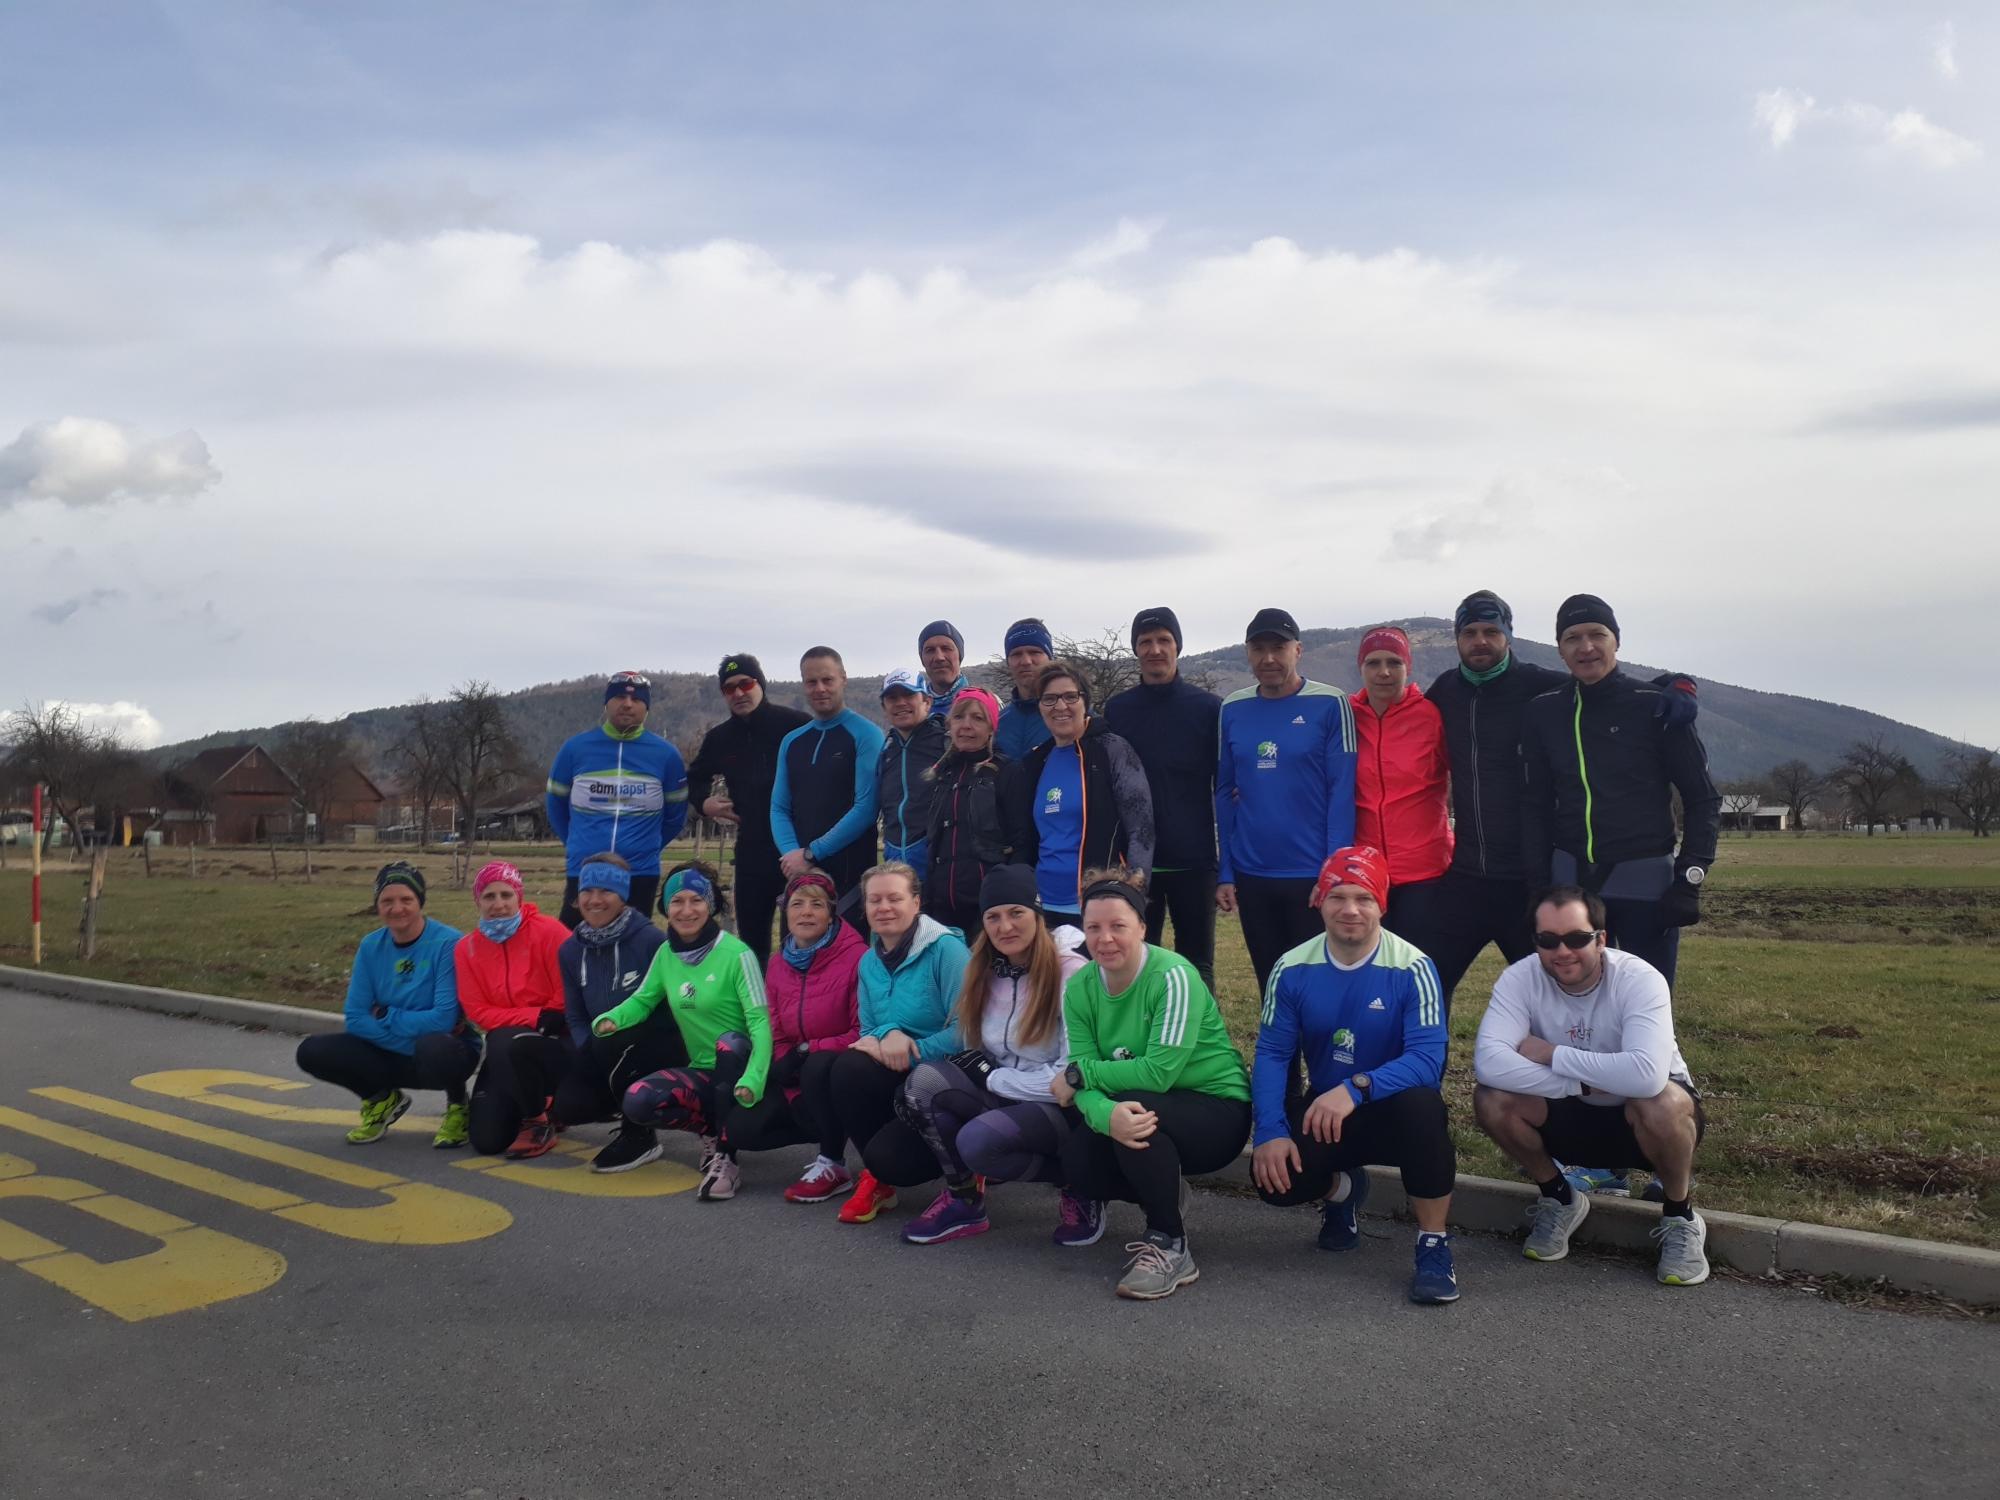 Udeleženci prvega uradnega treninga po trasi polmaratona Okul' jezera